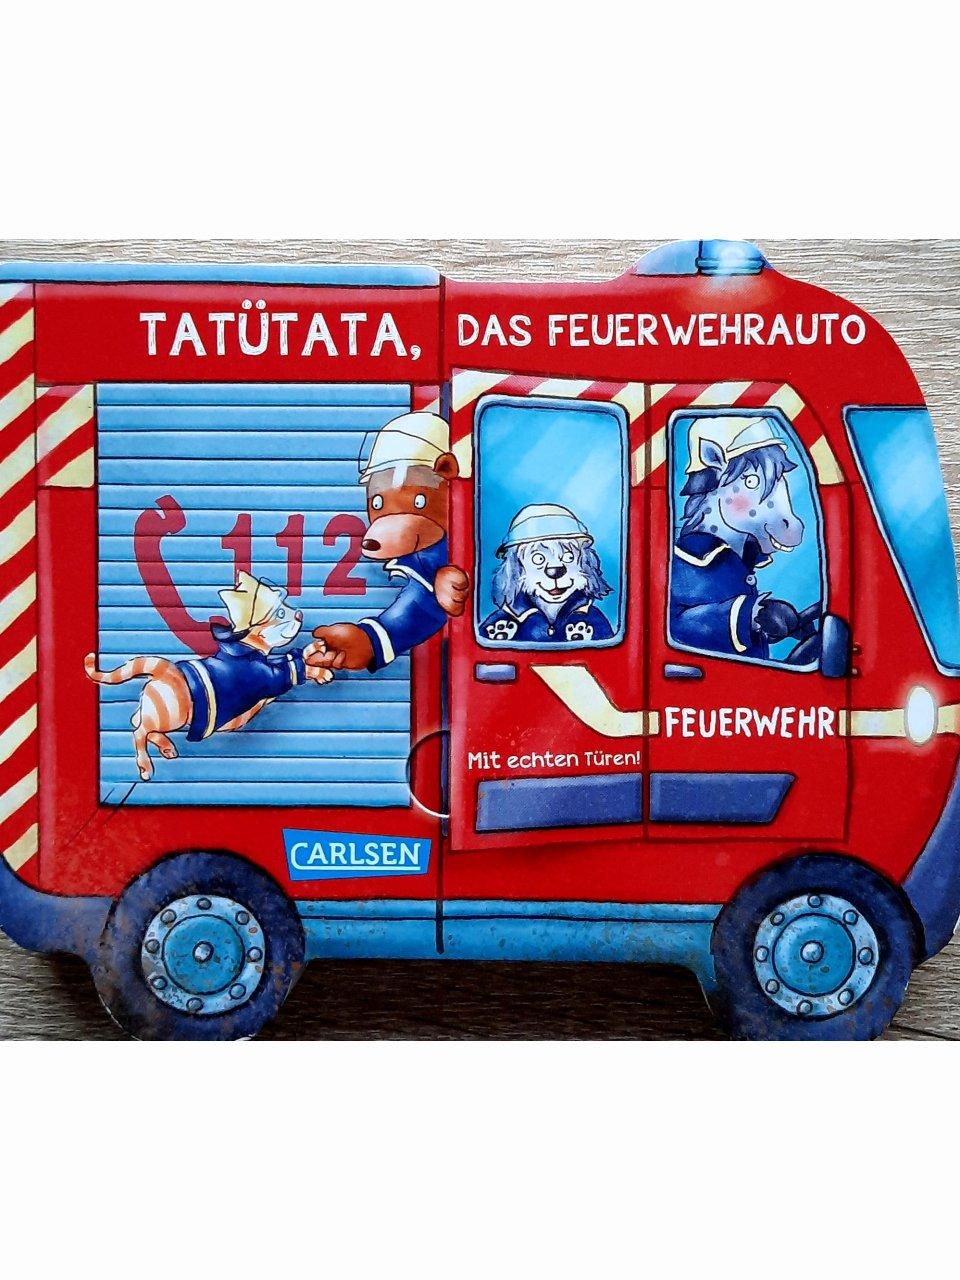 Tatütata, das Feuerwehrauto